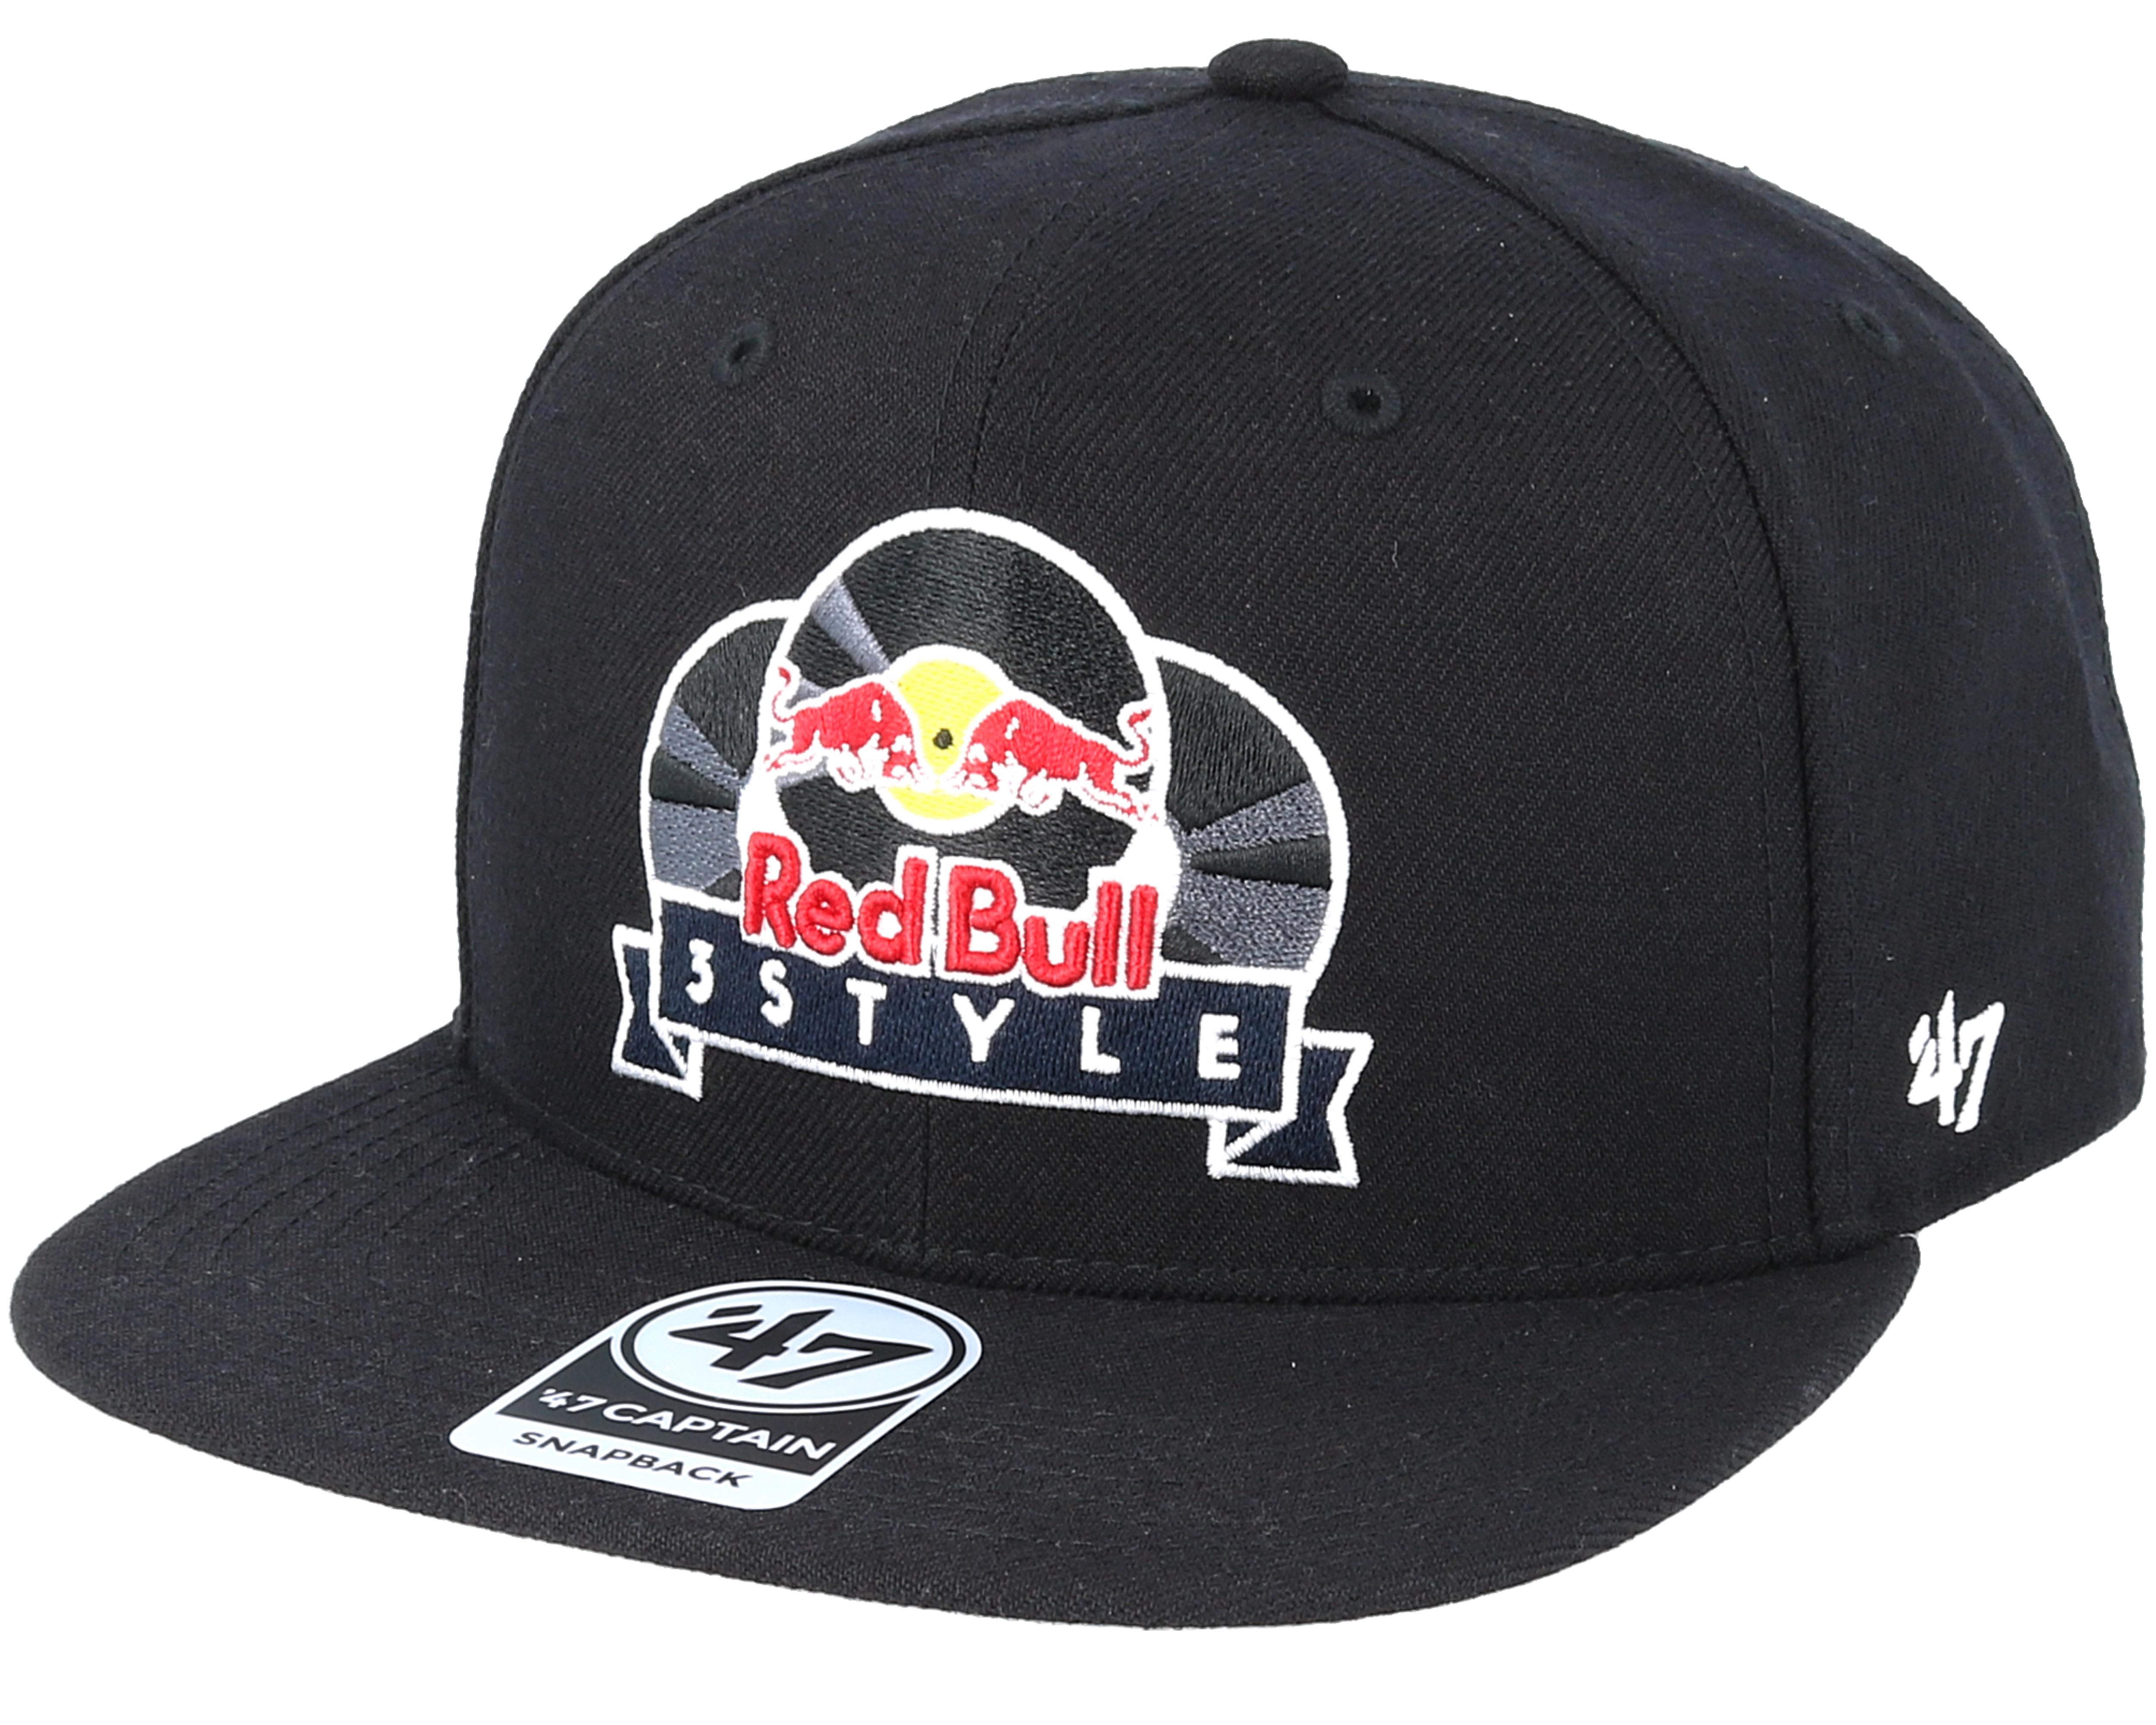 red bull hat